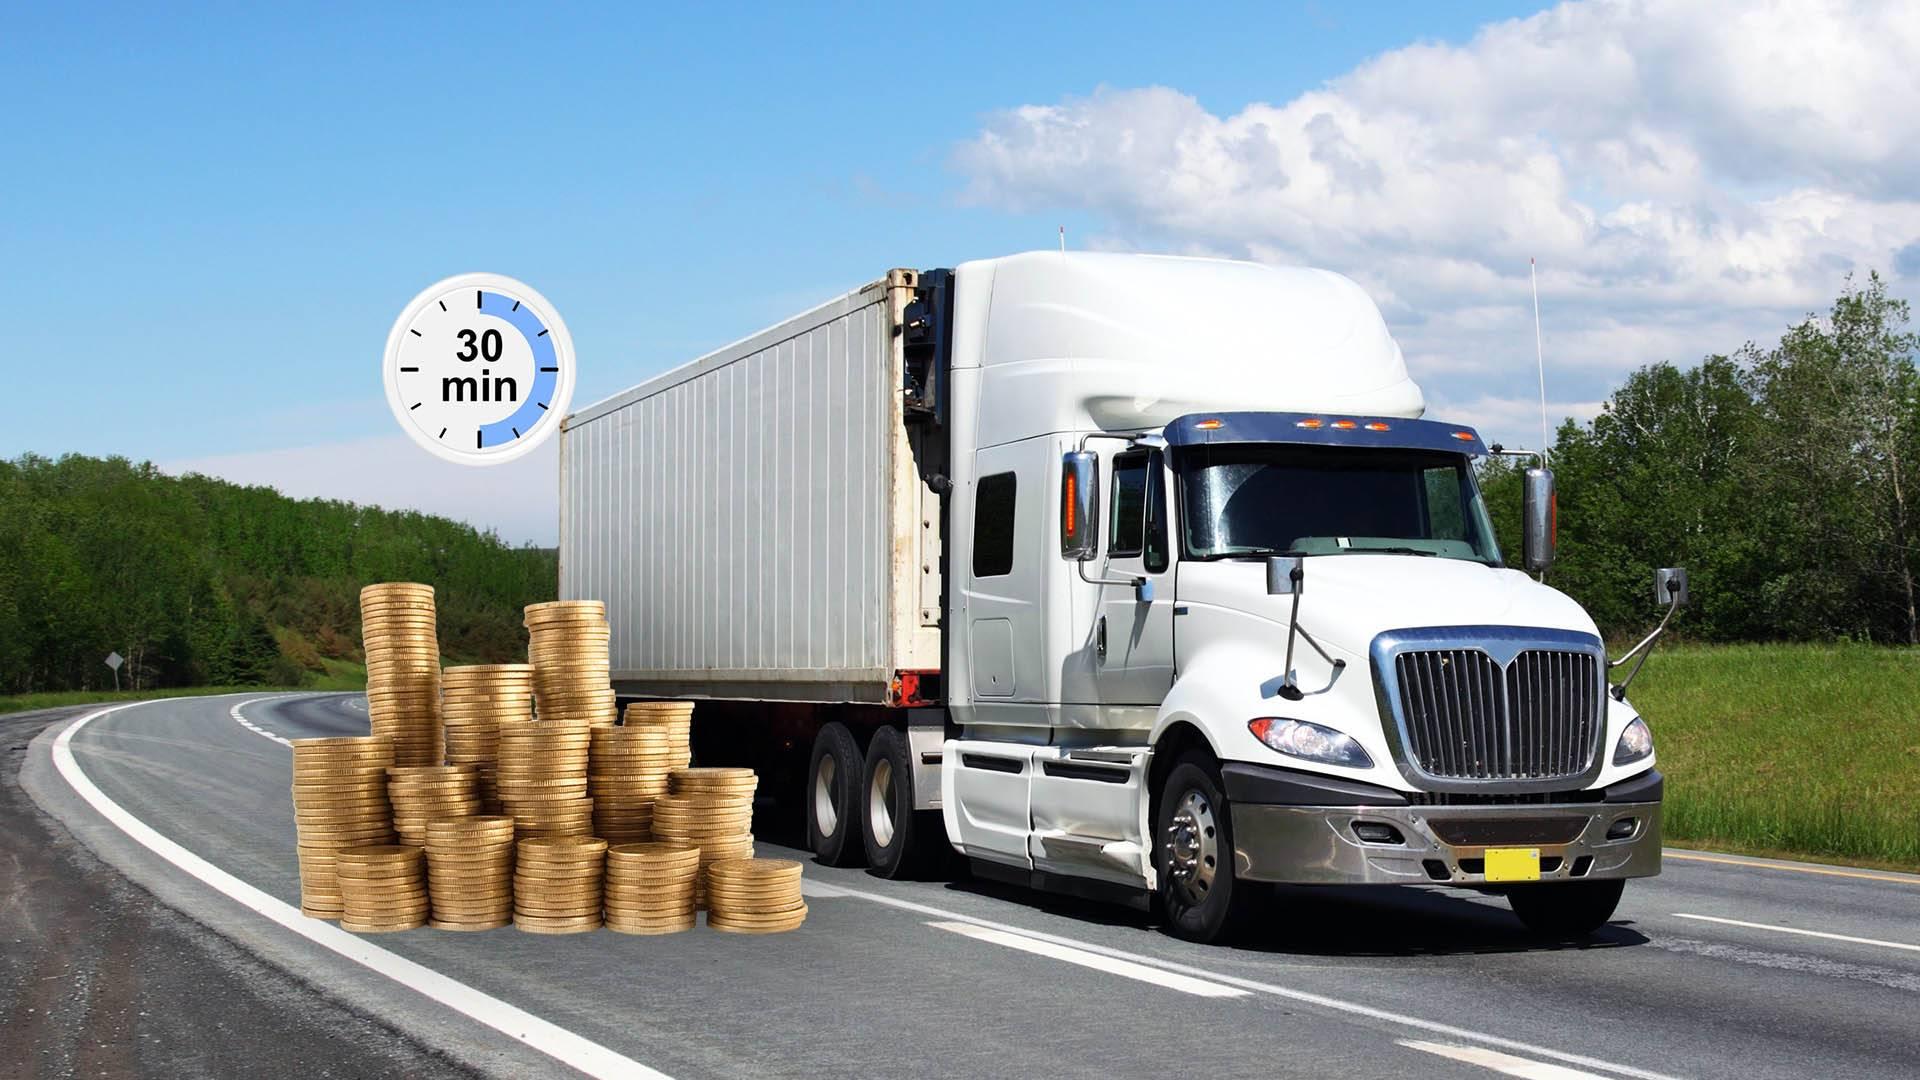 Кредит в Орле под залог ПТС грузового автомобиля. Займ под залог грузового транспорта